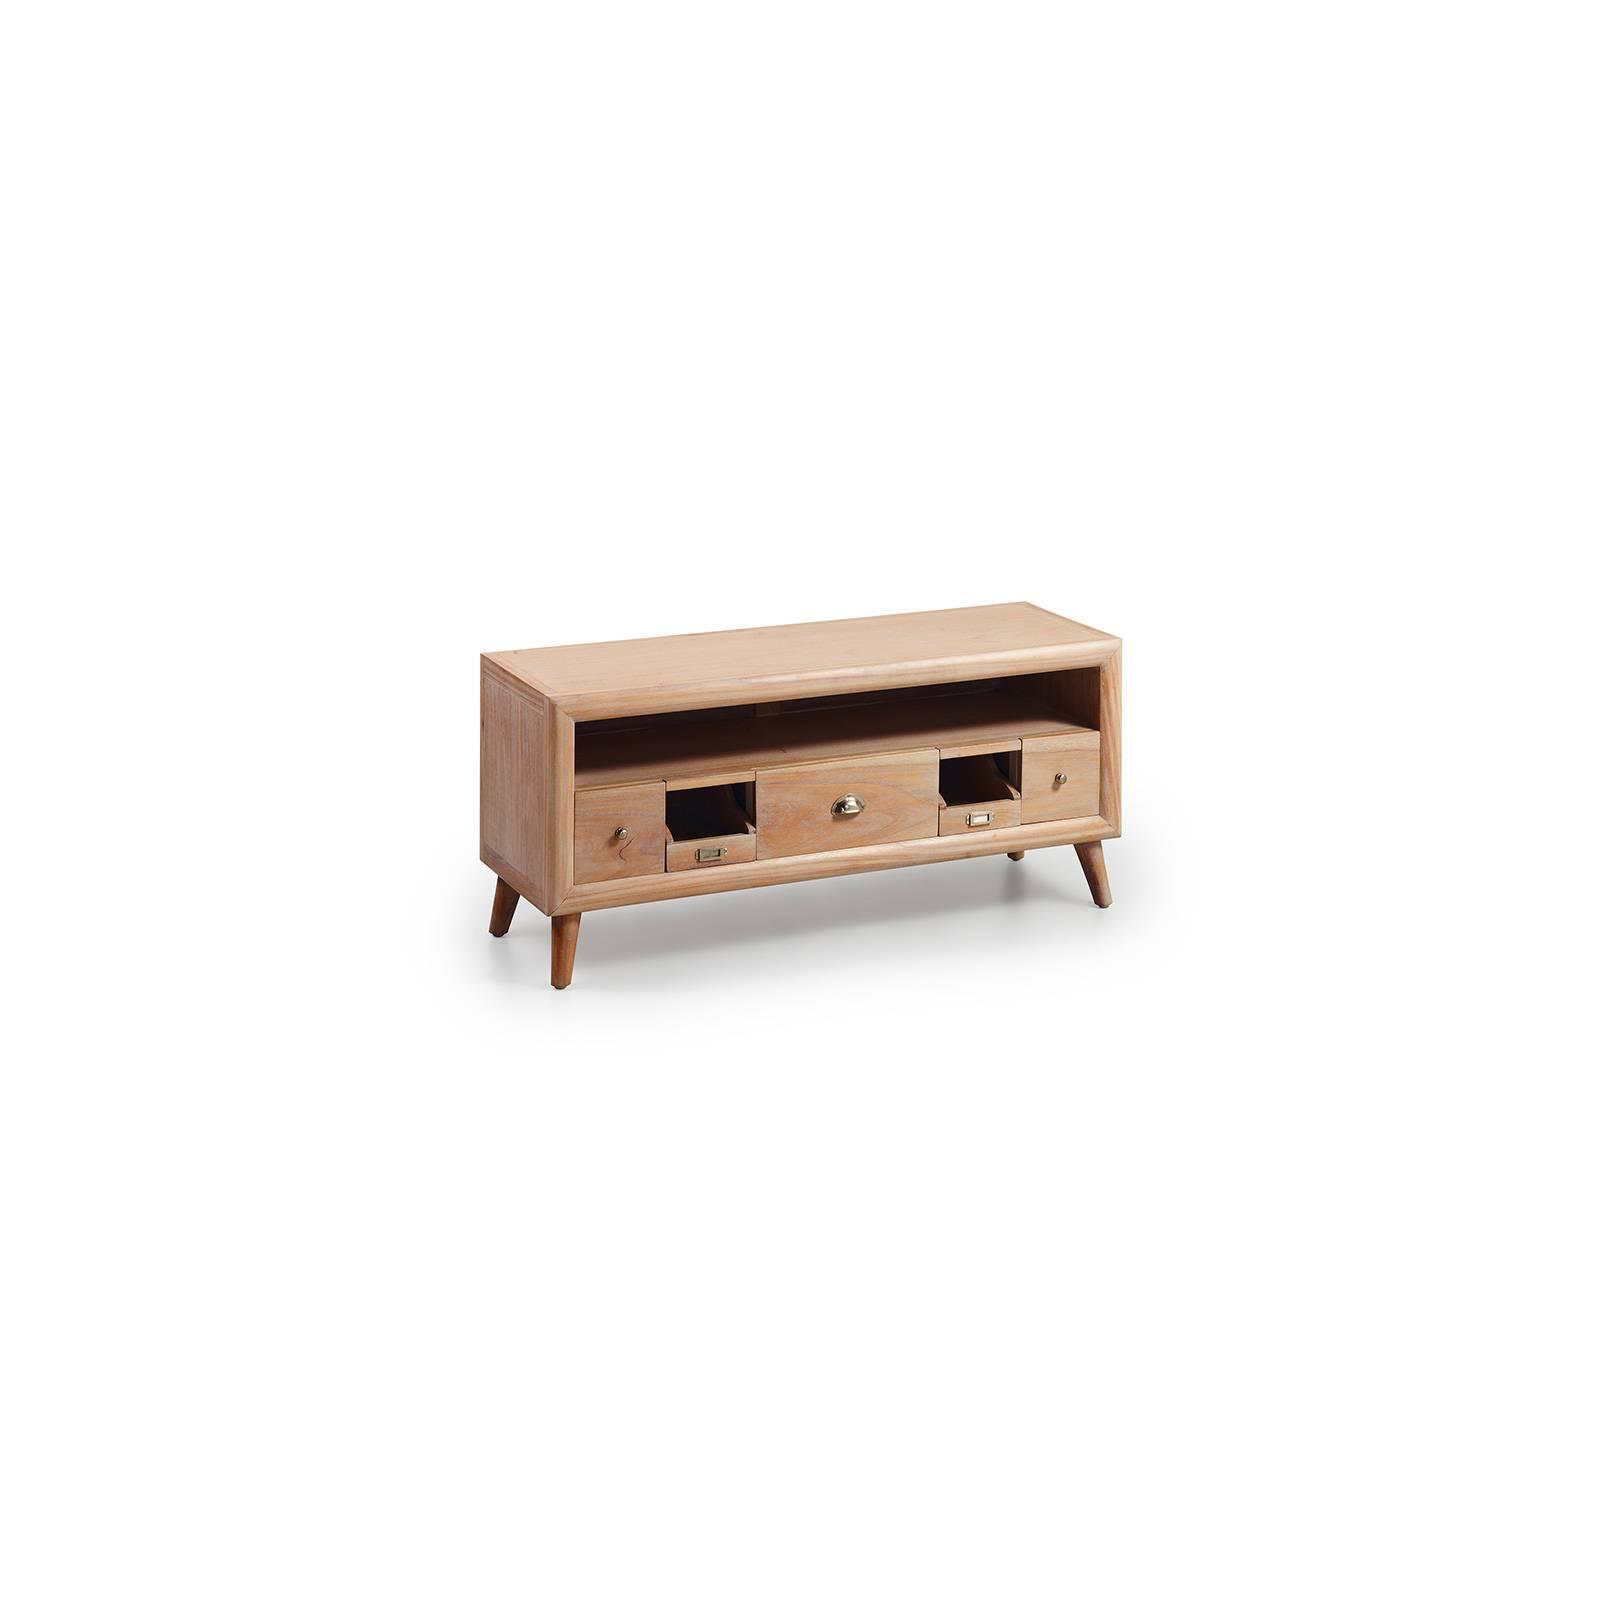 Meuble Tv PM Oslo Mindy - meubles scandinaves